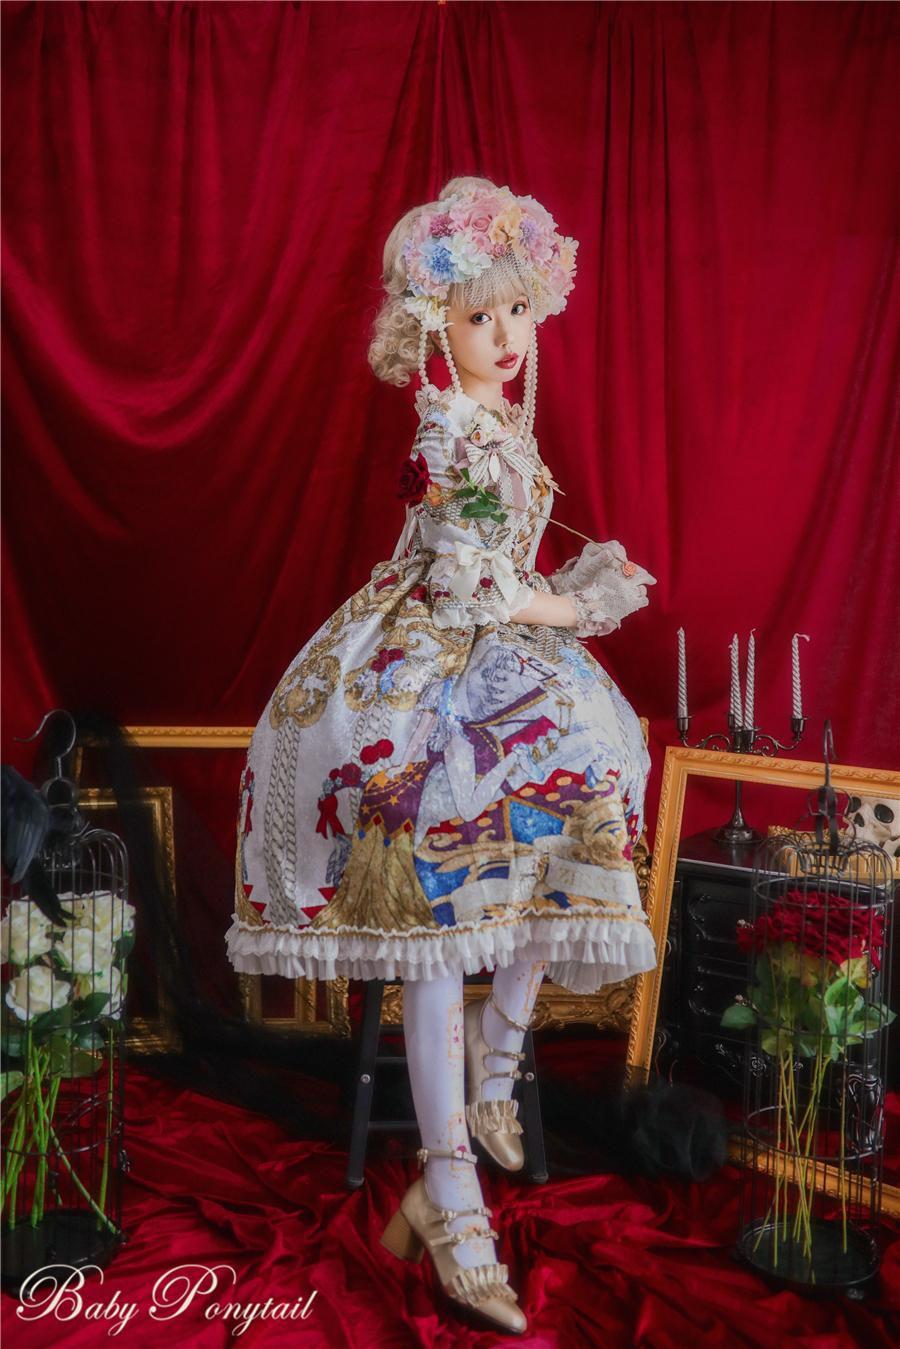 Baby Ponytail_Circus Princess_Silver OP_Kaka_11.jpg